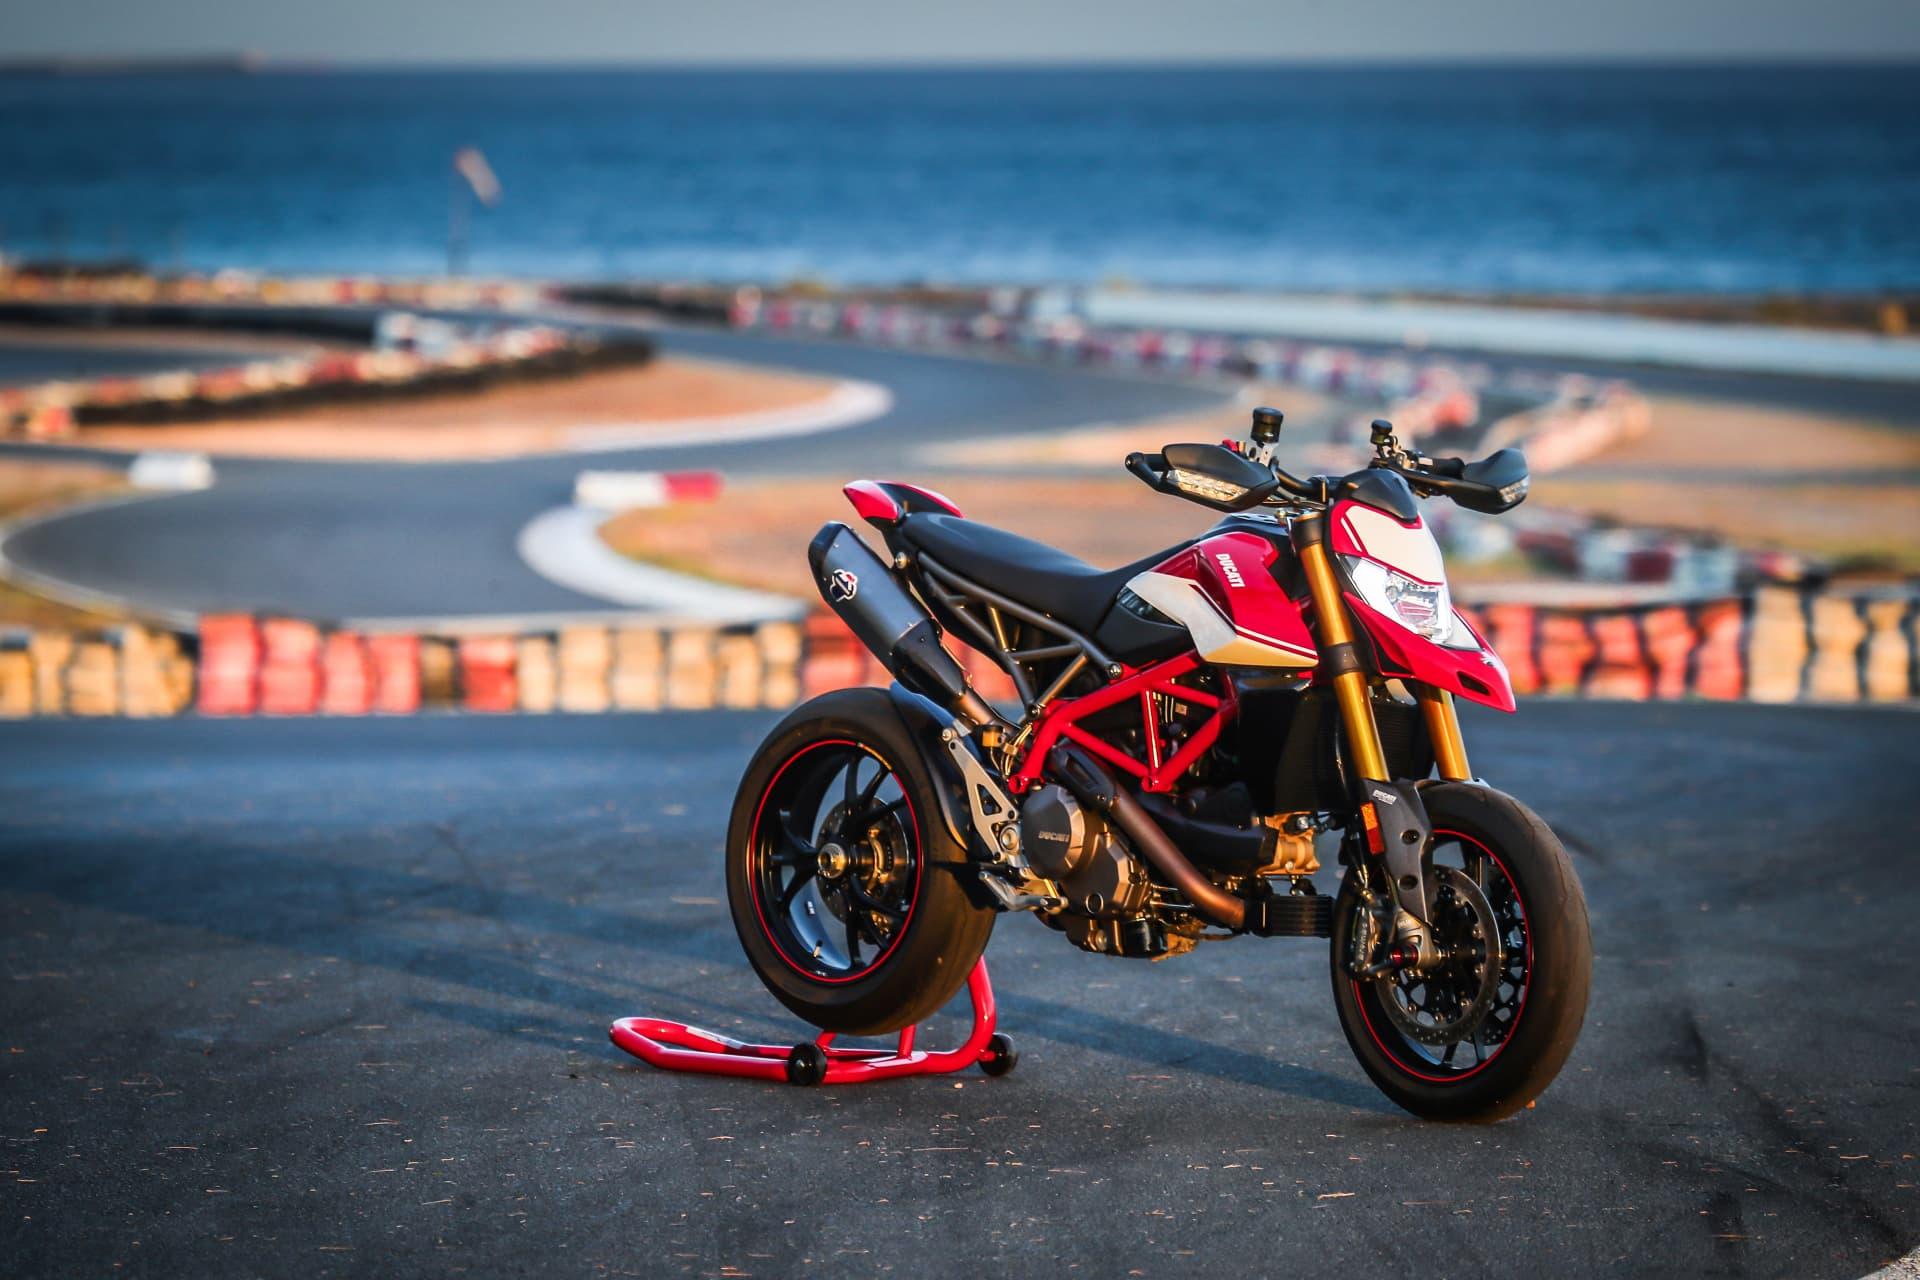 Ducati Hypermotard 950 Sp Static 05 Uc70305 Mid